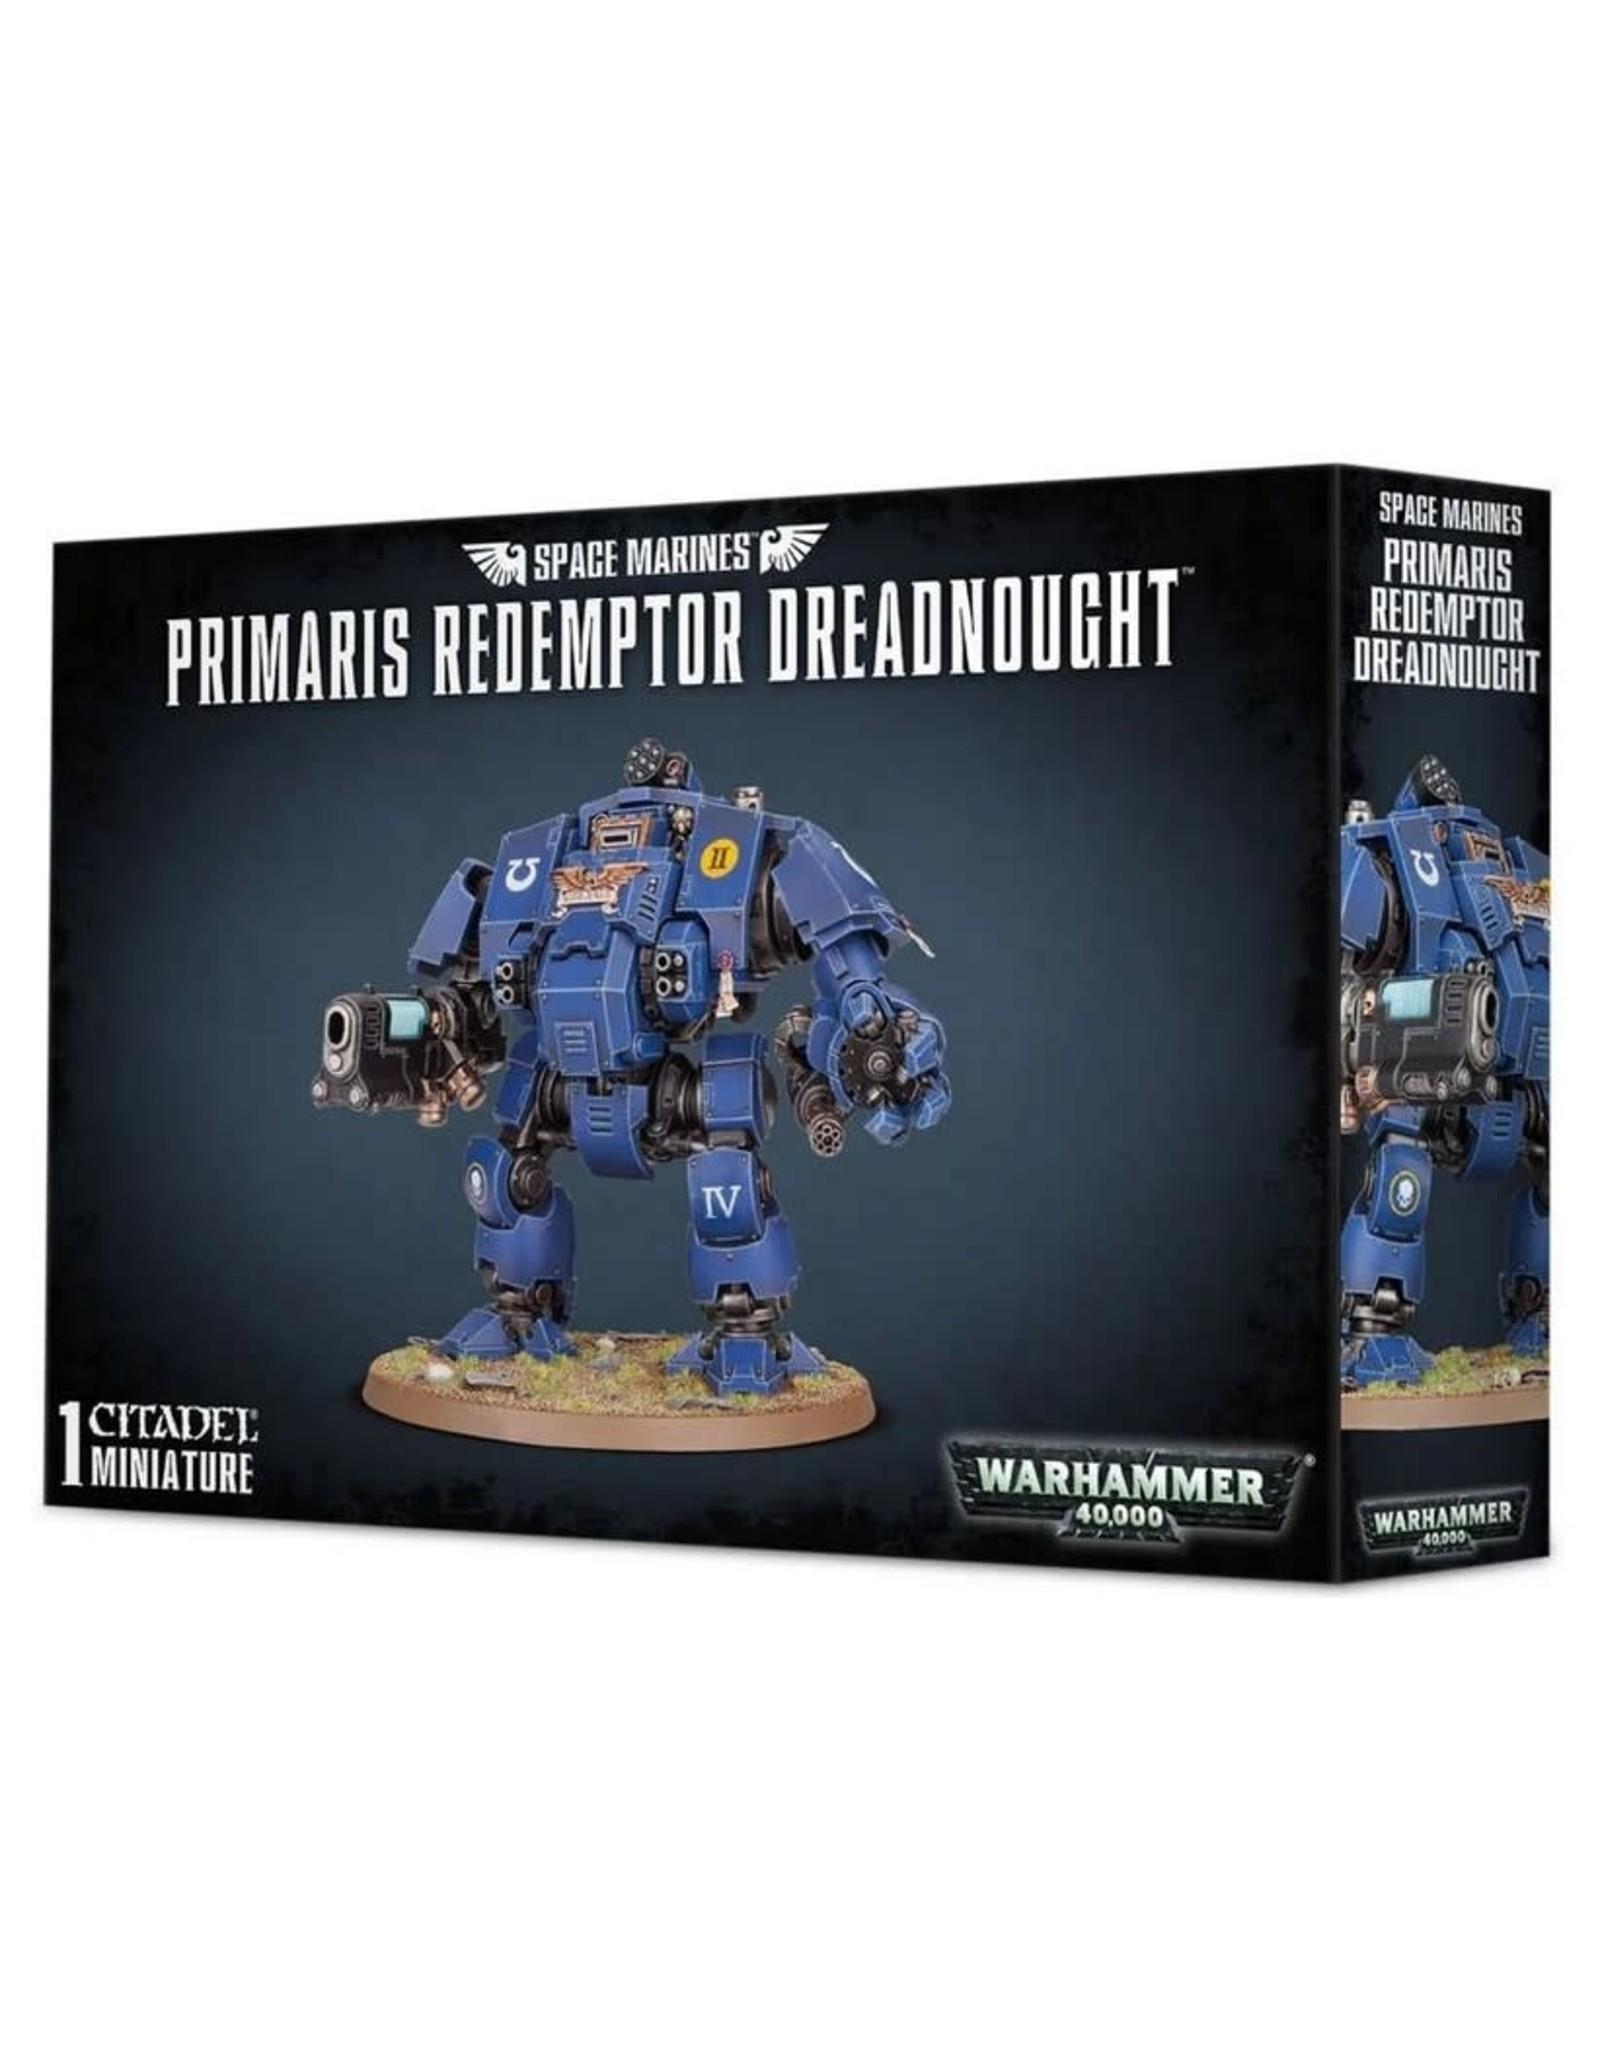 Warhammer 40K WH40K Primaris Redemptor Dreadnaught